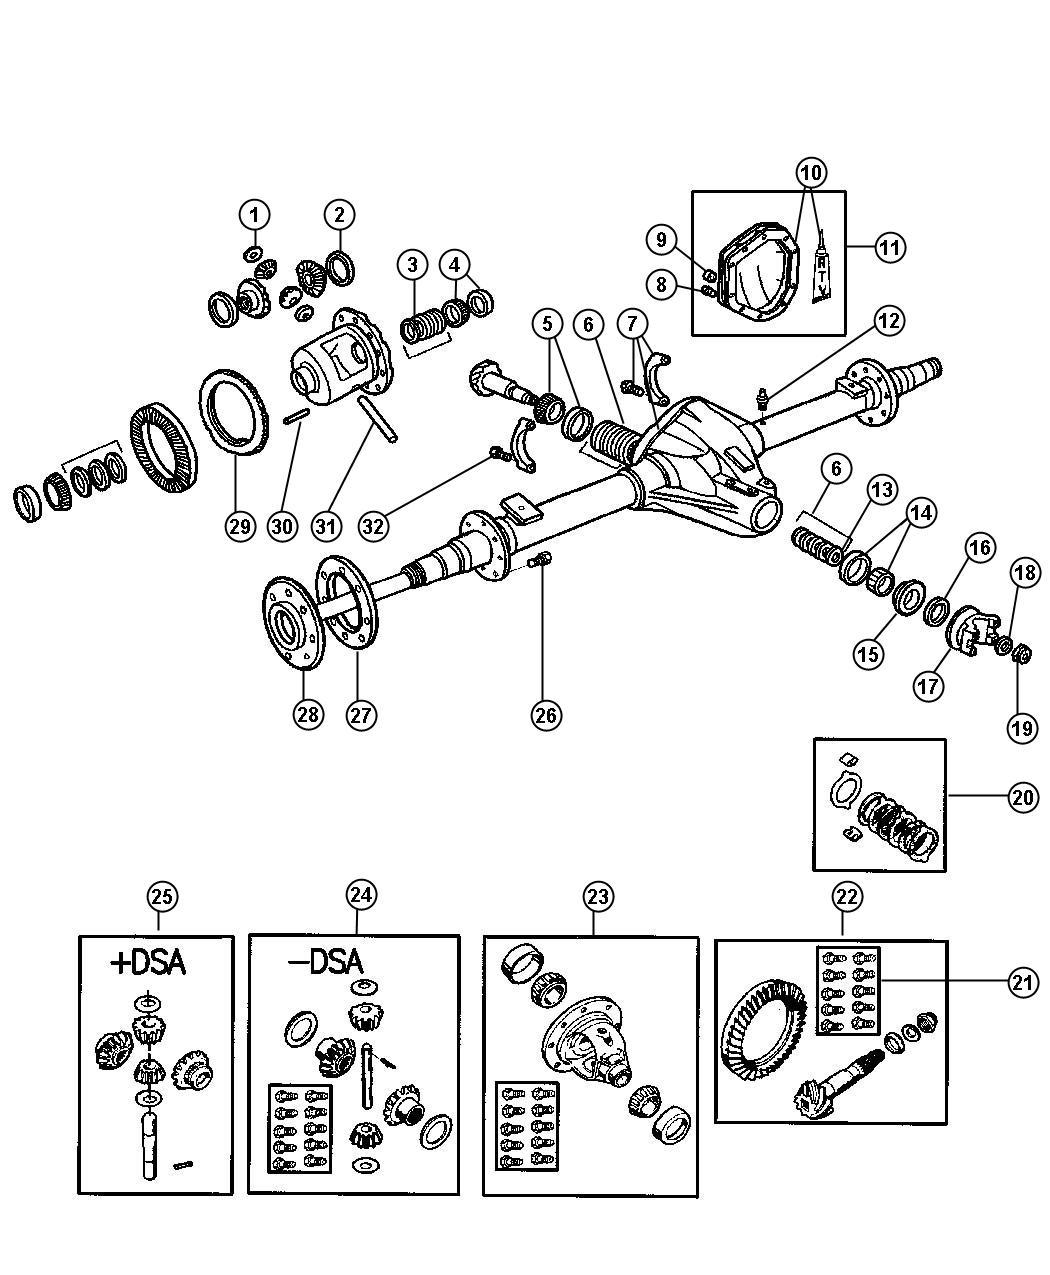 c4 corvette wiring diagram speaker